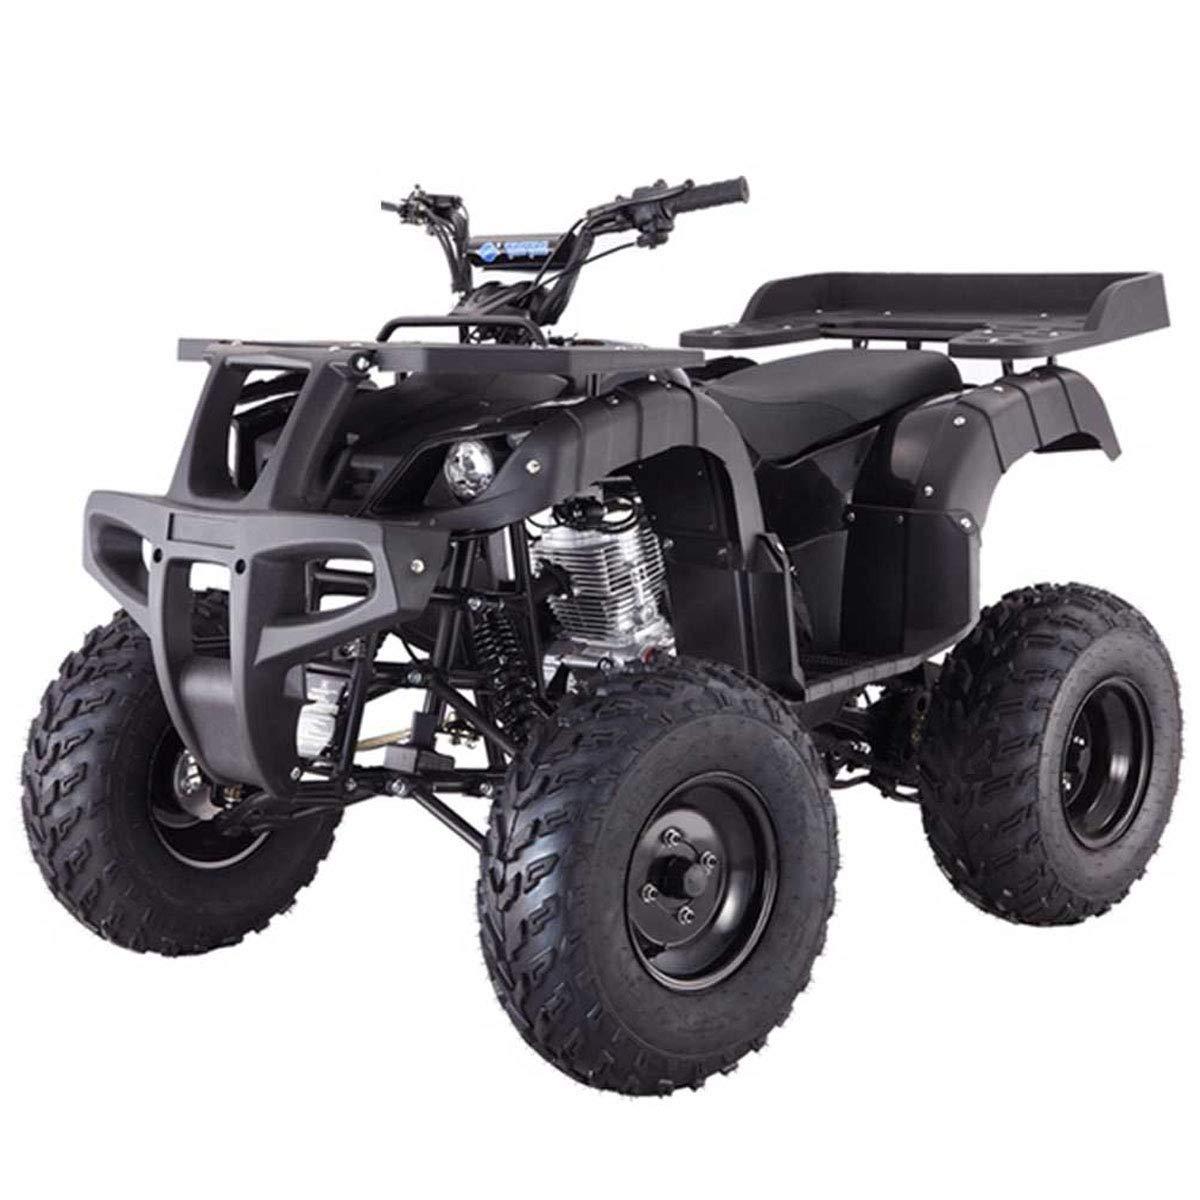 X-Pro 250 ATV Quad Four Wheelers 250 Utility ATV Full Size ATV Quad Adult ATVs with Gloves Goggle and Handgrip